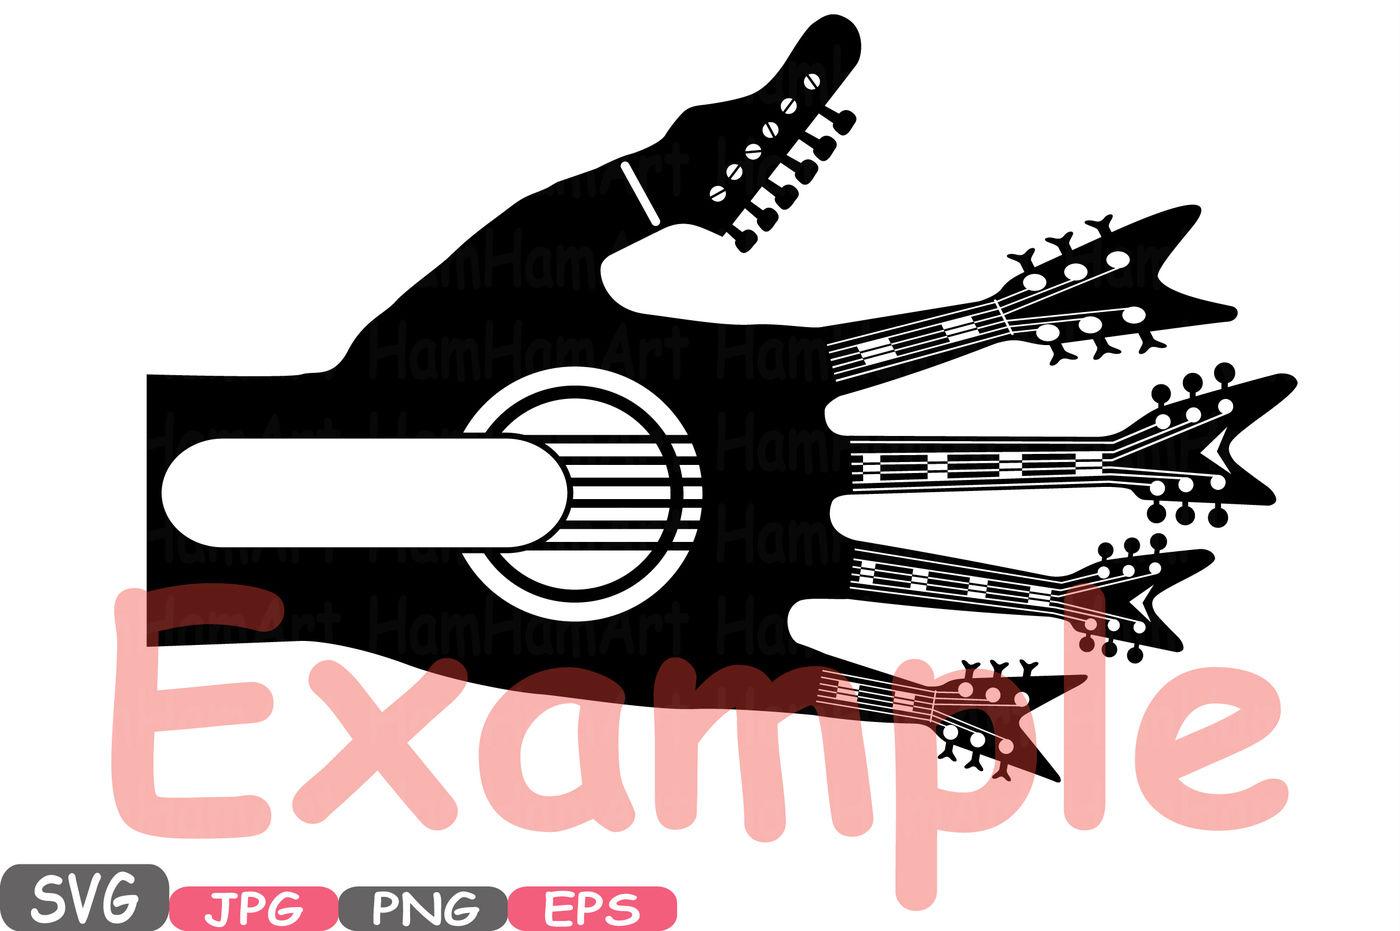 hight resolution of  split rock n roll music cutting files svg